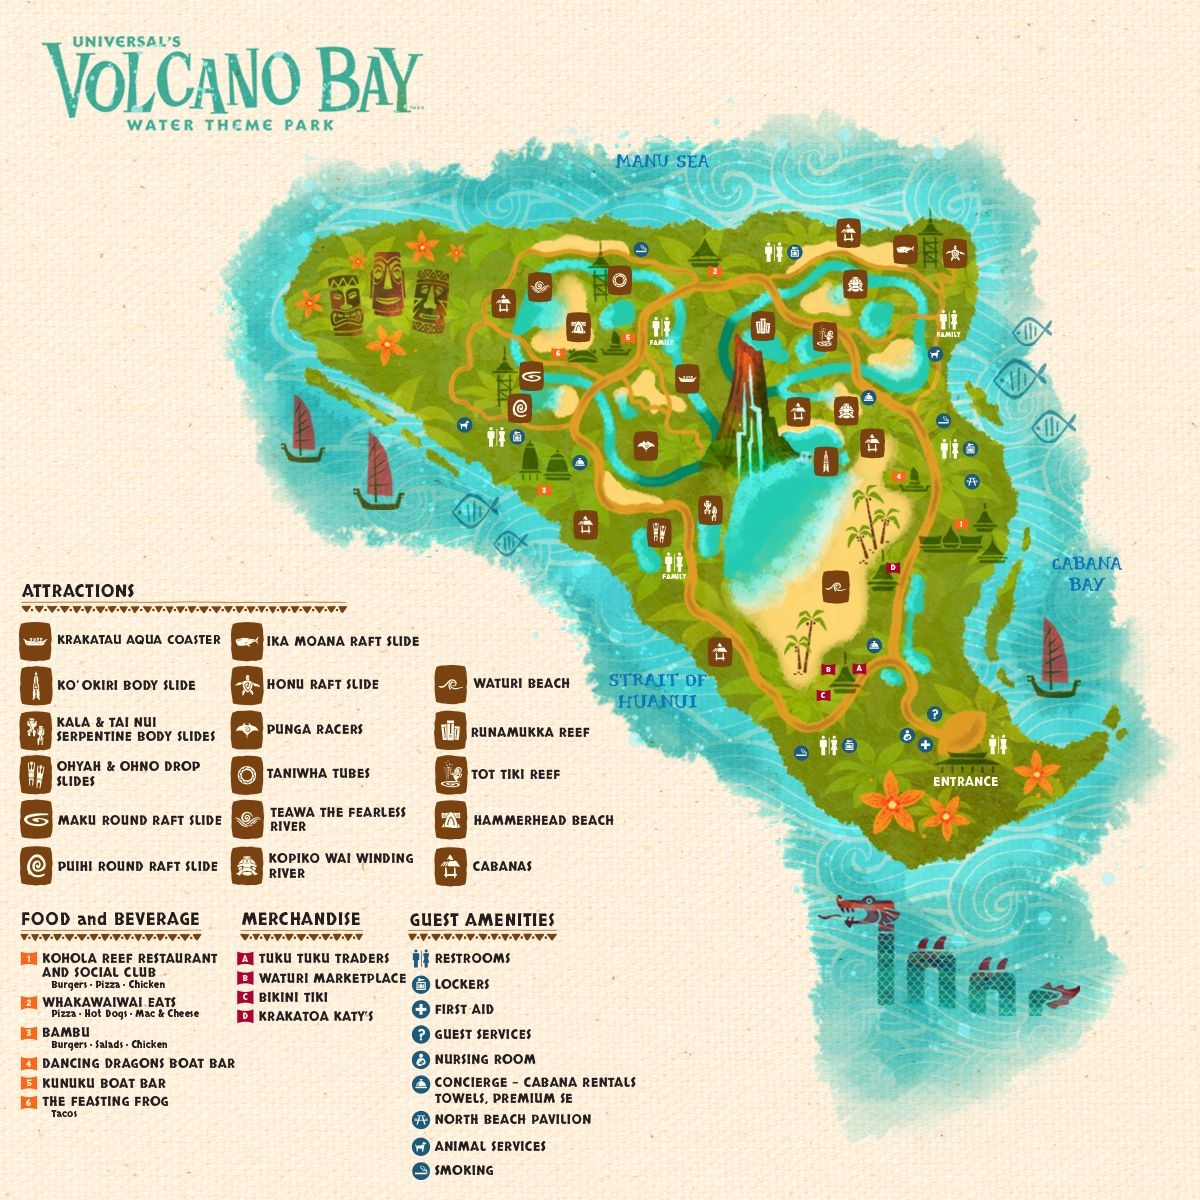 Start planning your next trip to Universal Orlando Resort by